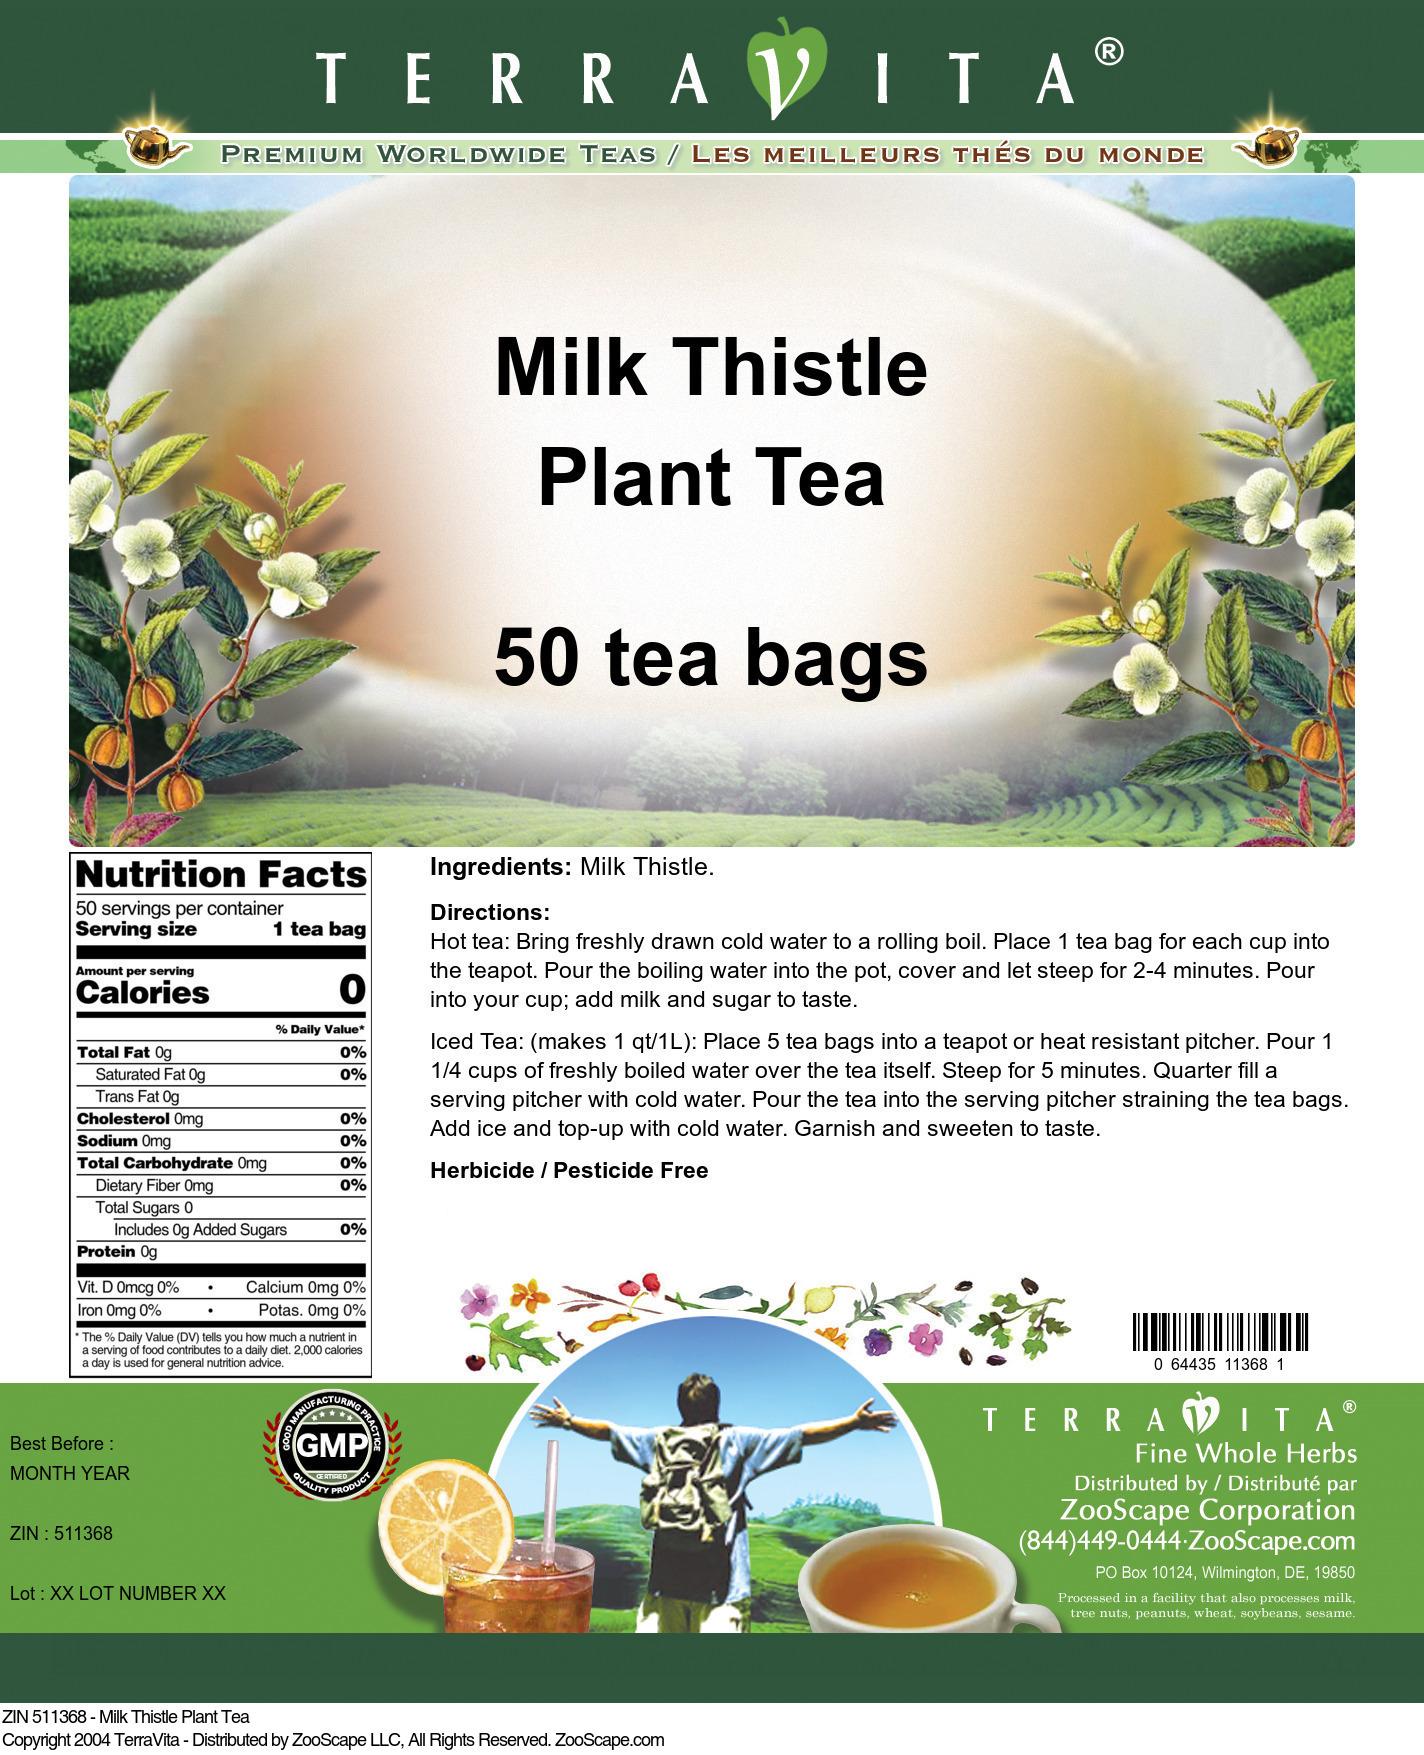 Milk Thistle Plant Tea